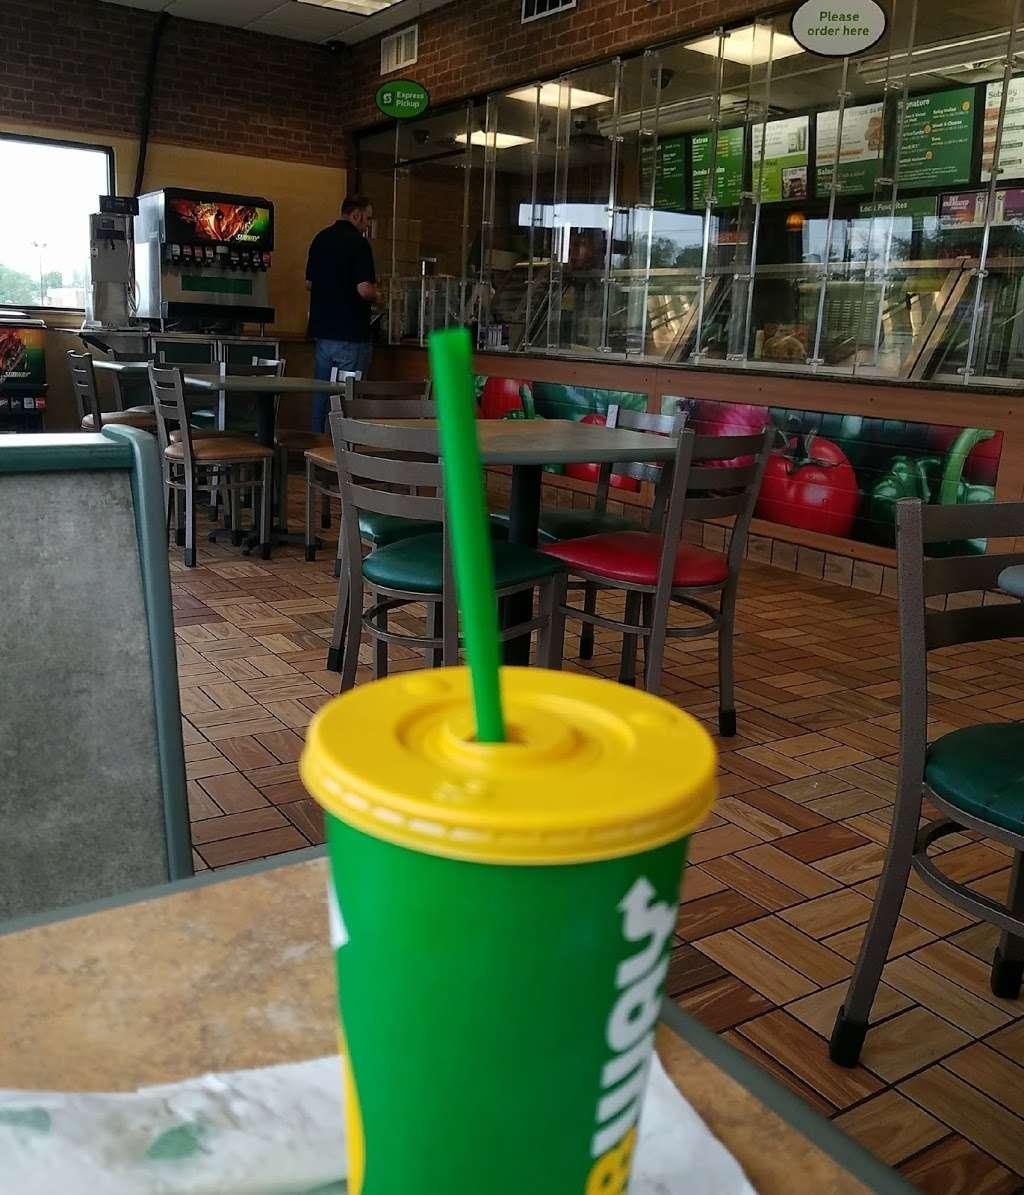 Subway - restaurant  | Photo 2 of 6 | Address: 3400 Grant St, Gary, IN 46408, USA | Phone: (219) 887-3000